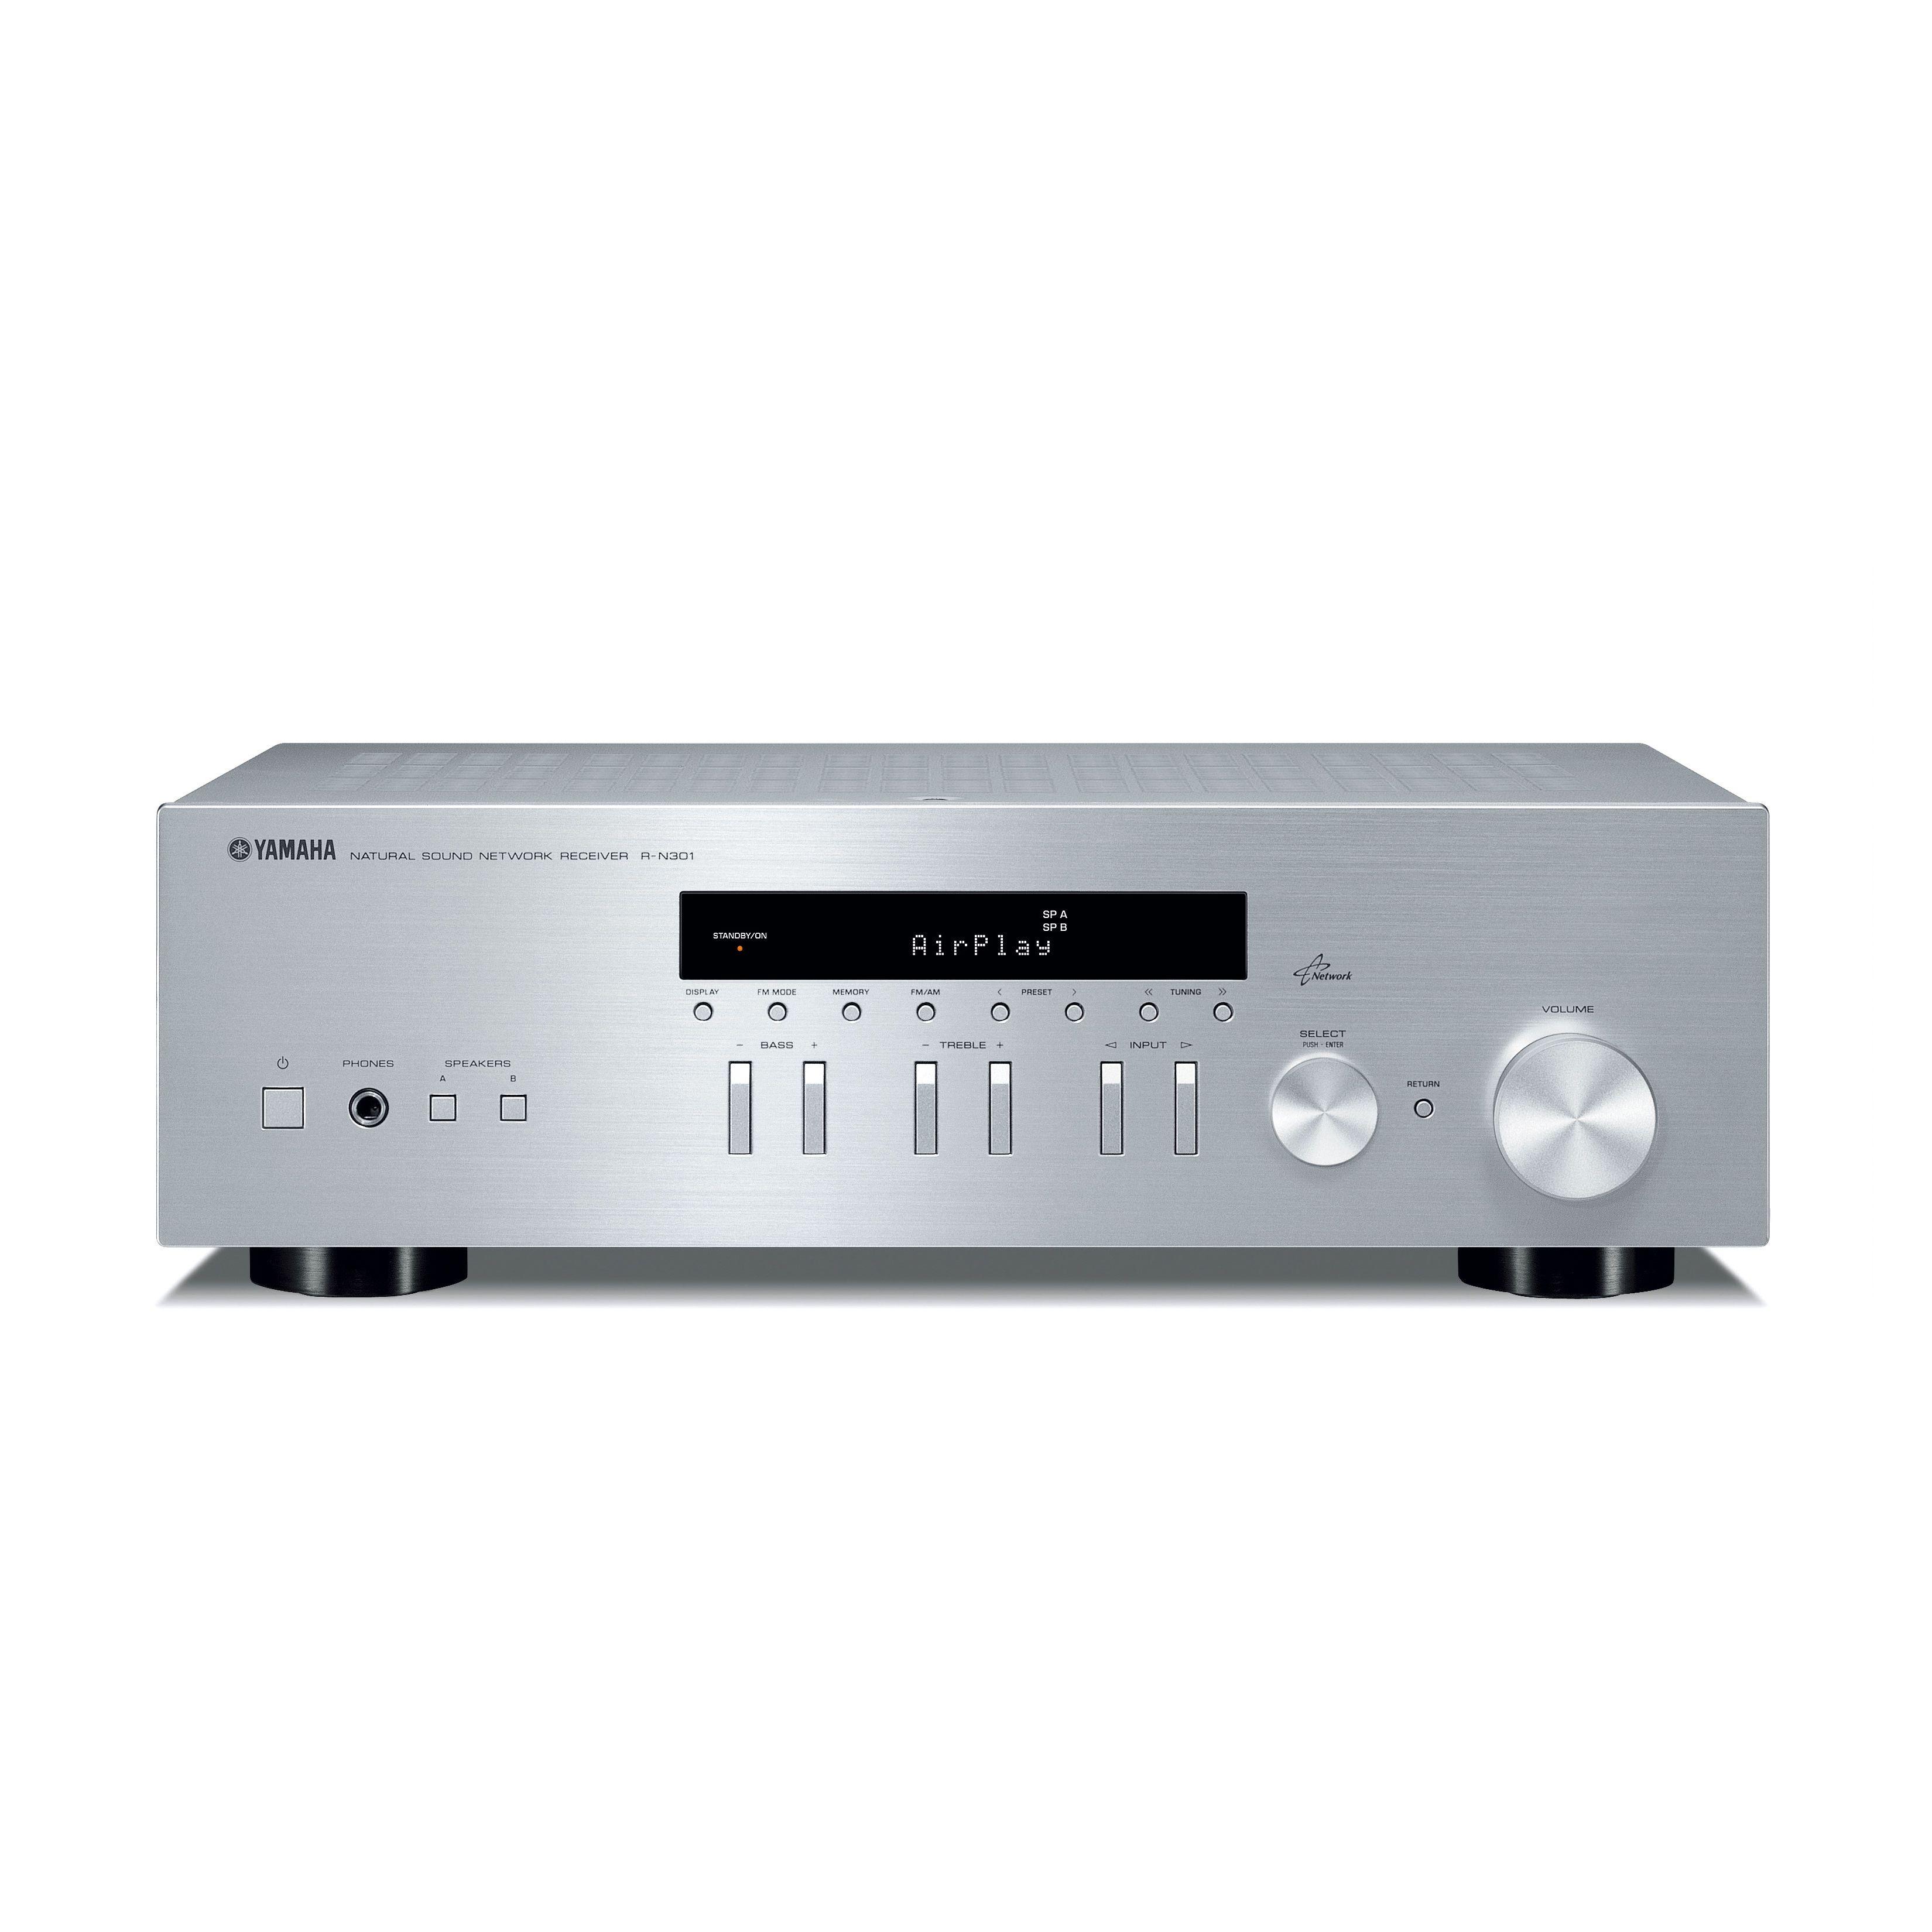 stereo receivers yamaha australia. Black Bedroom Furniture Sets. Home Design Ideas